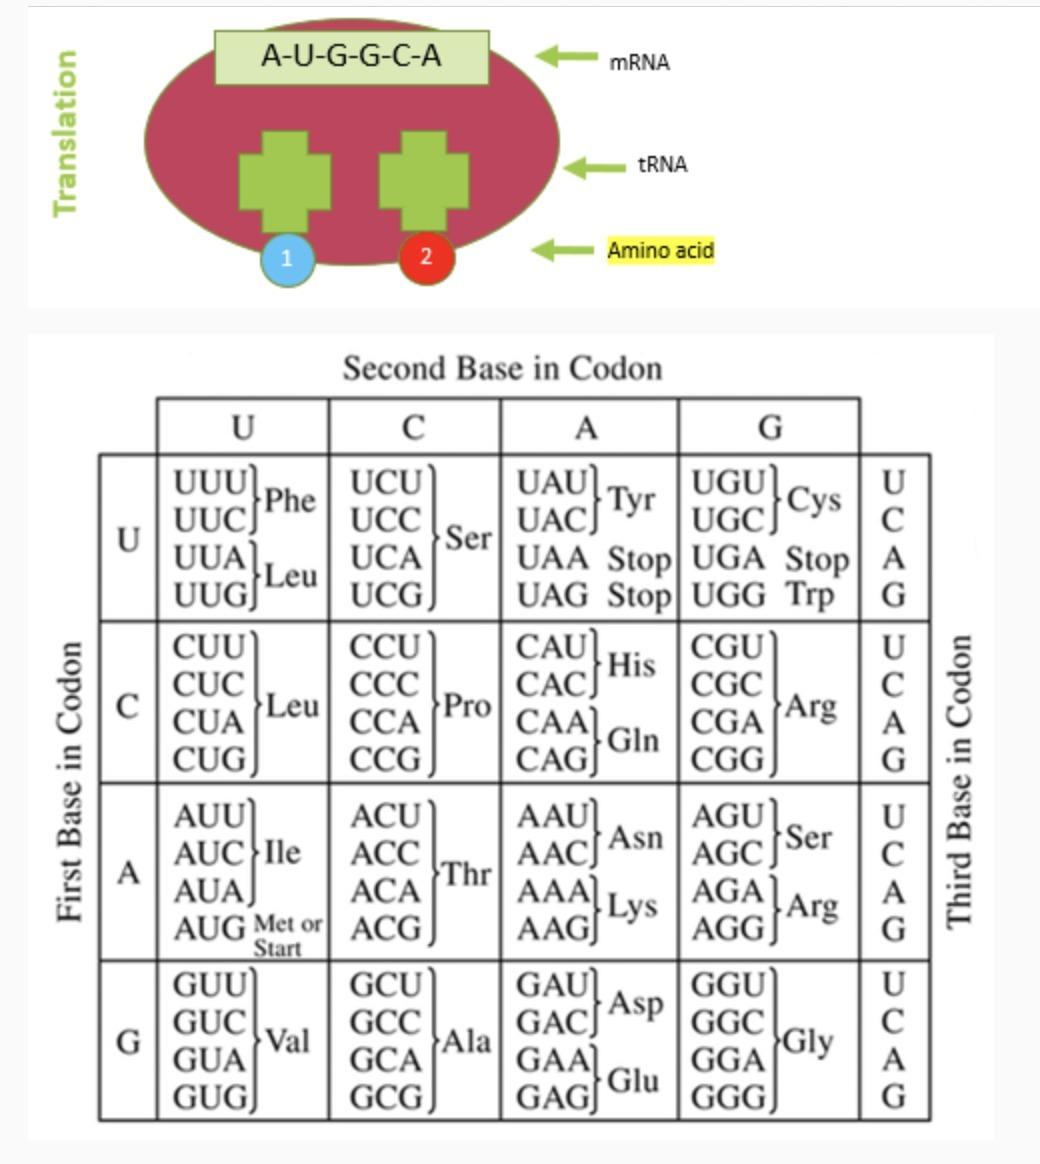 Using The Chart, Translate The MRNA Into Amino Acids